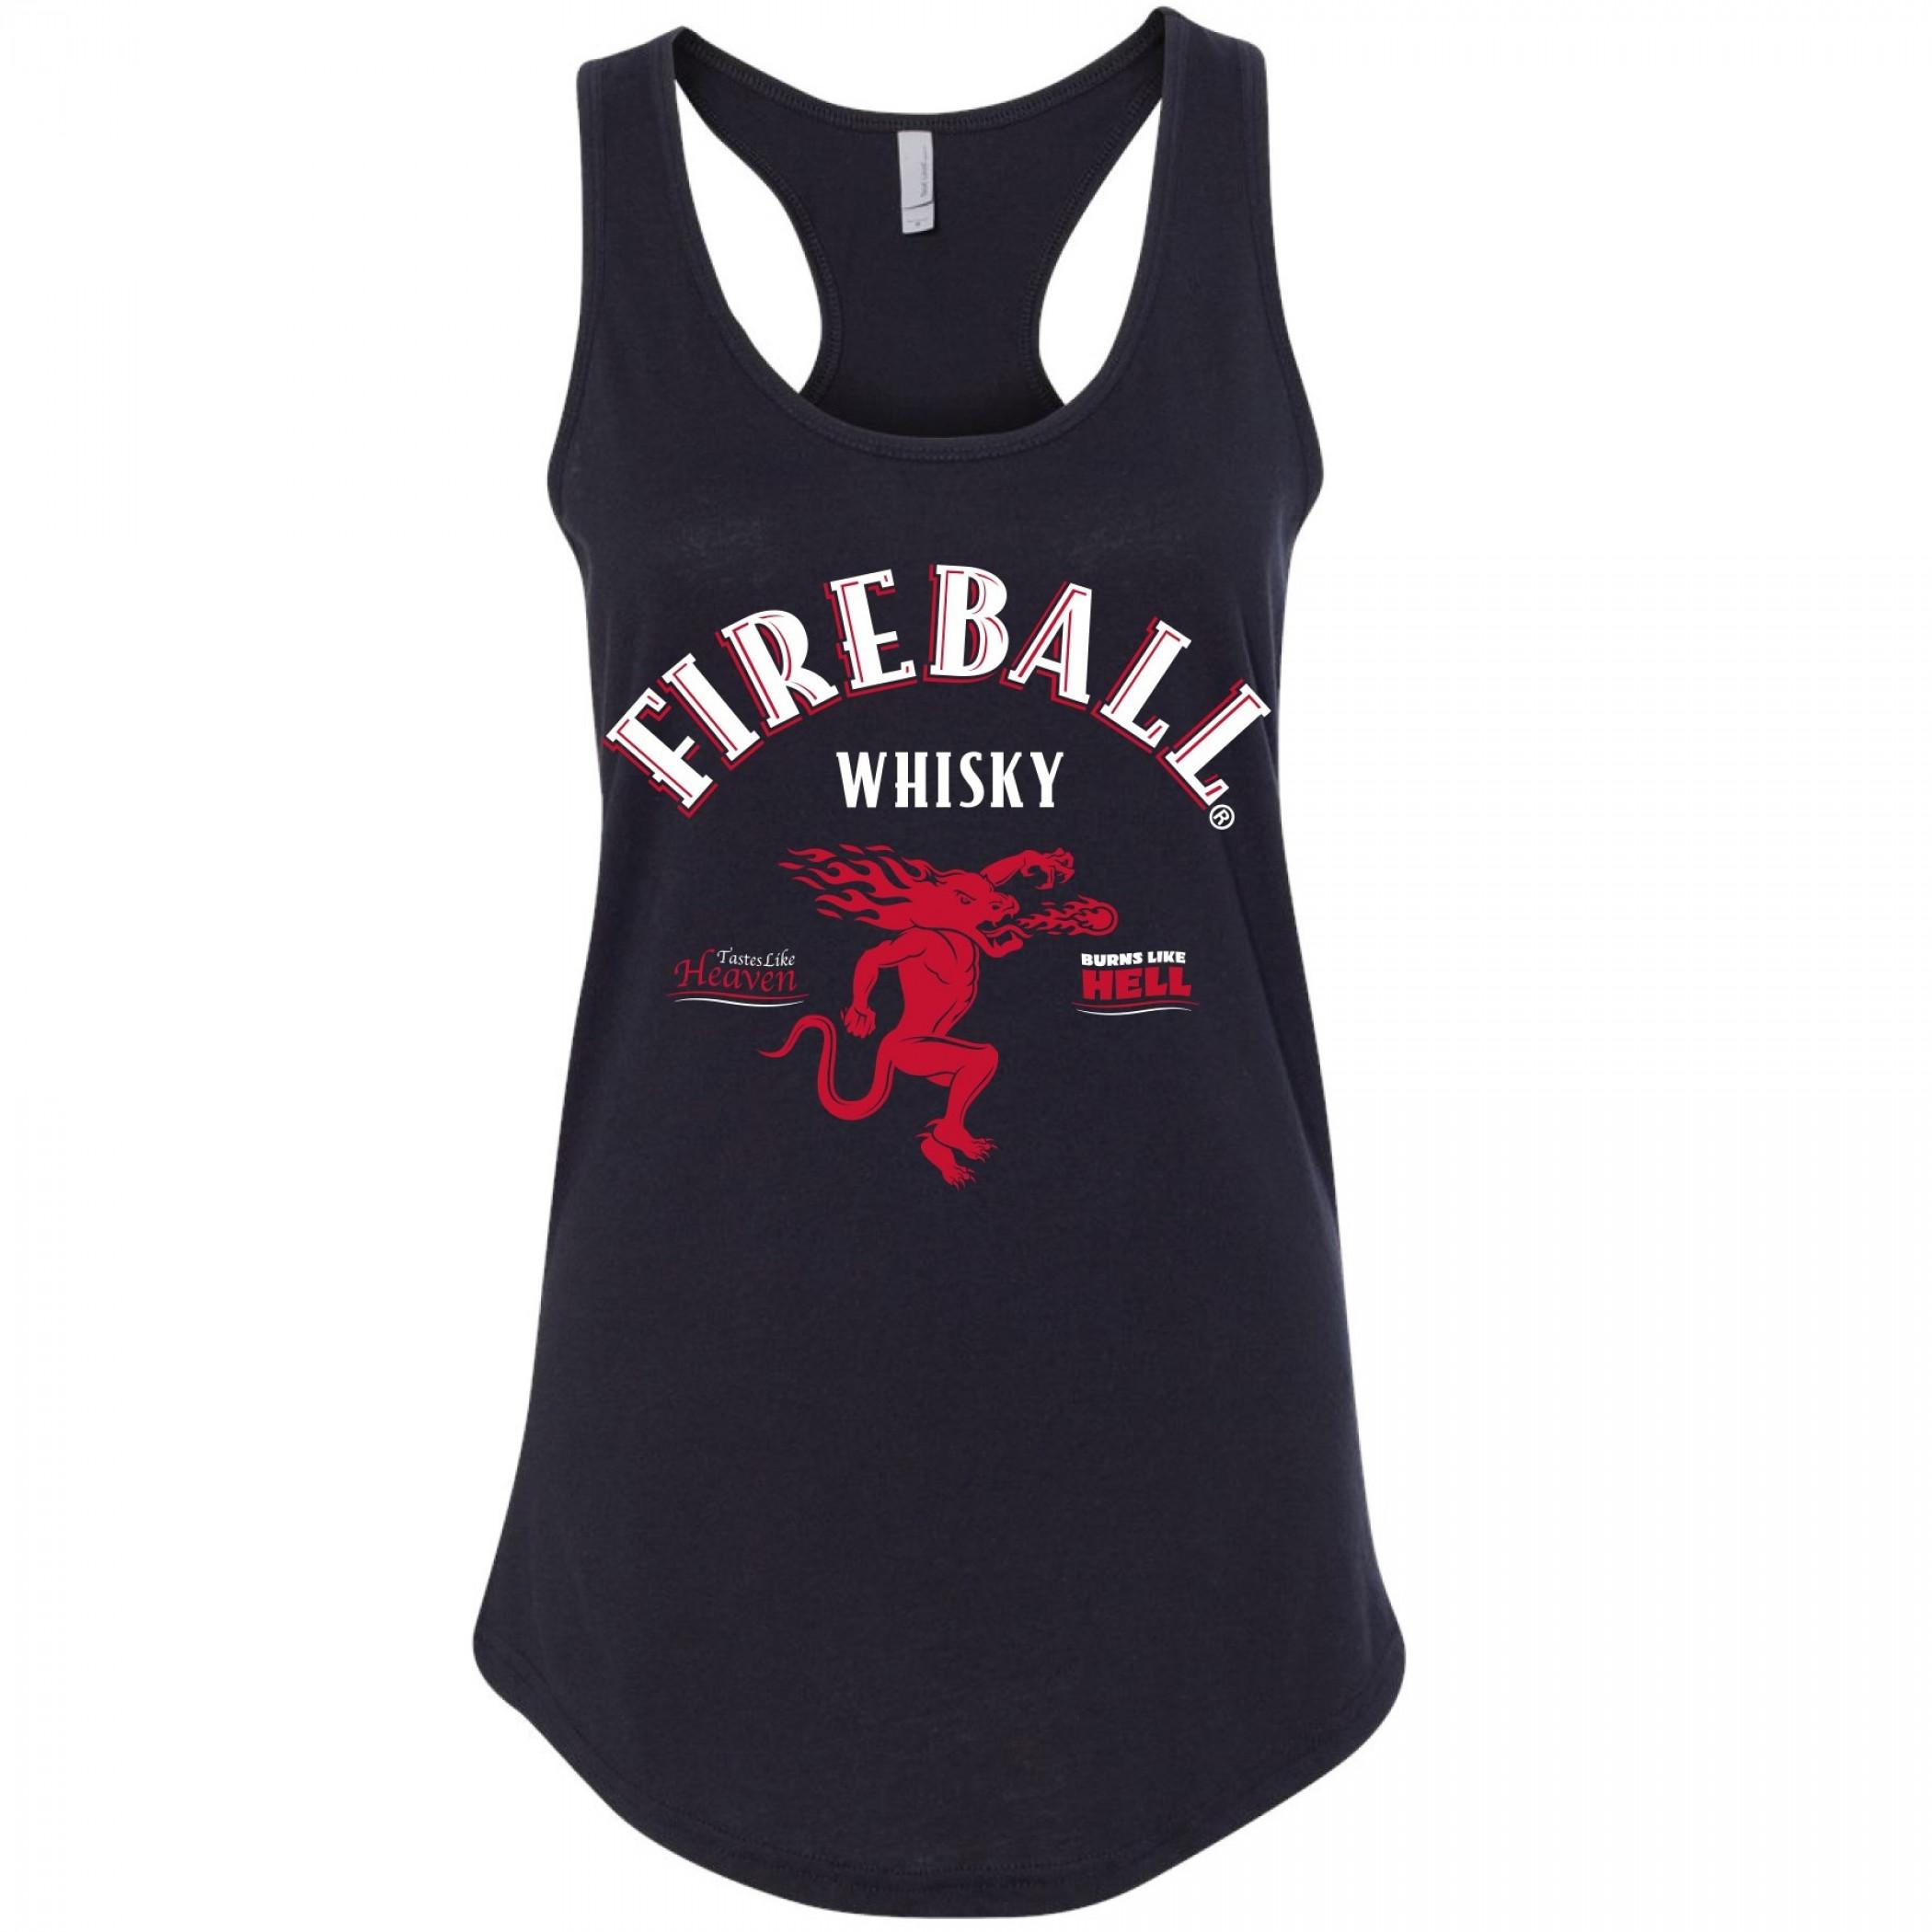 Fireball Whisky Women's Racerback Tank Top